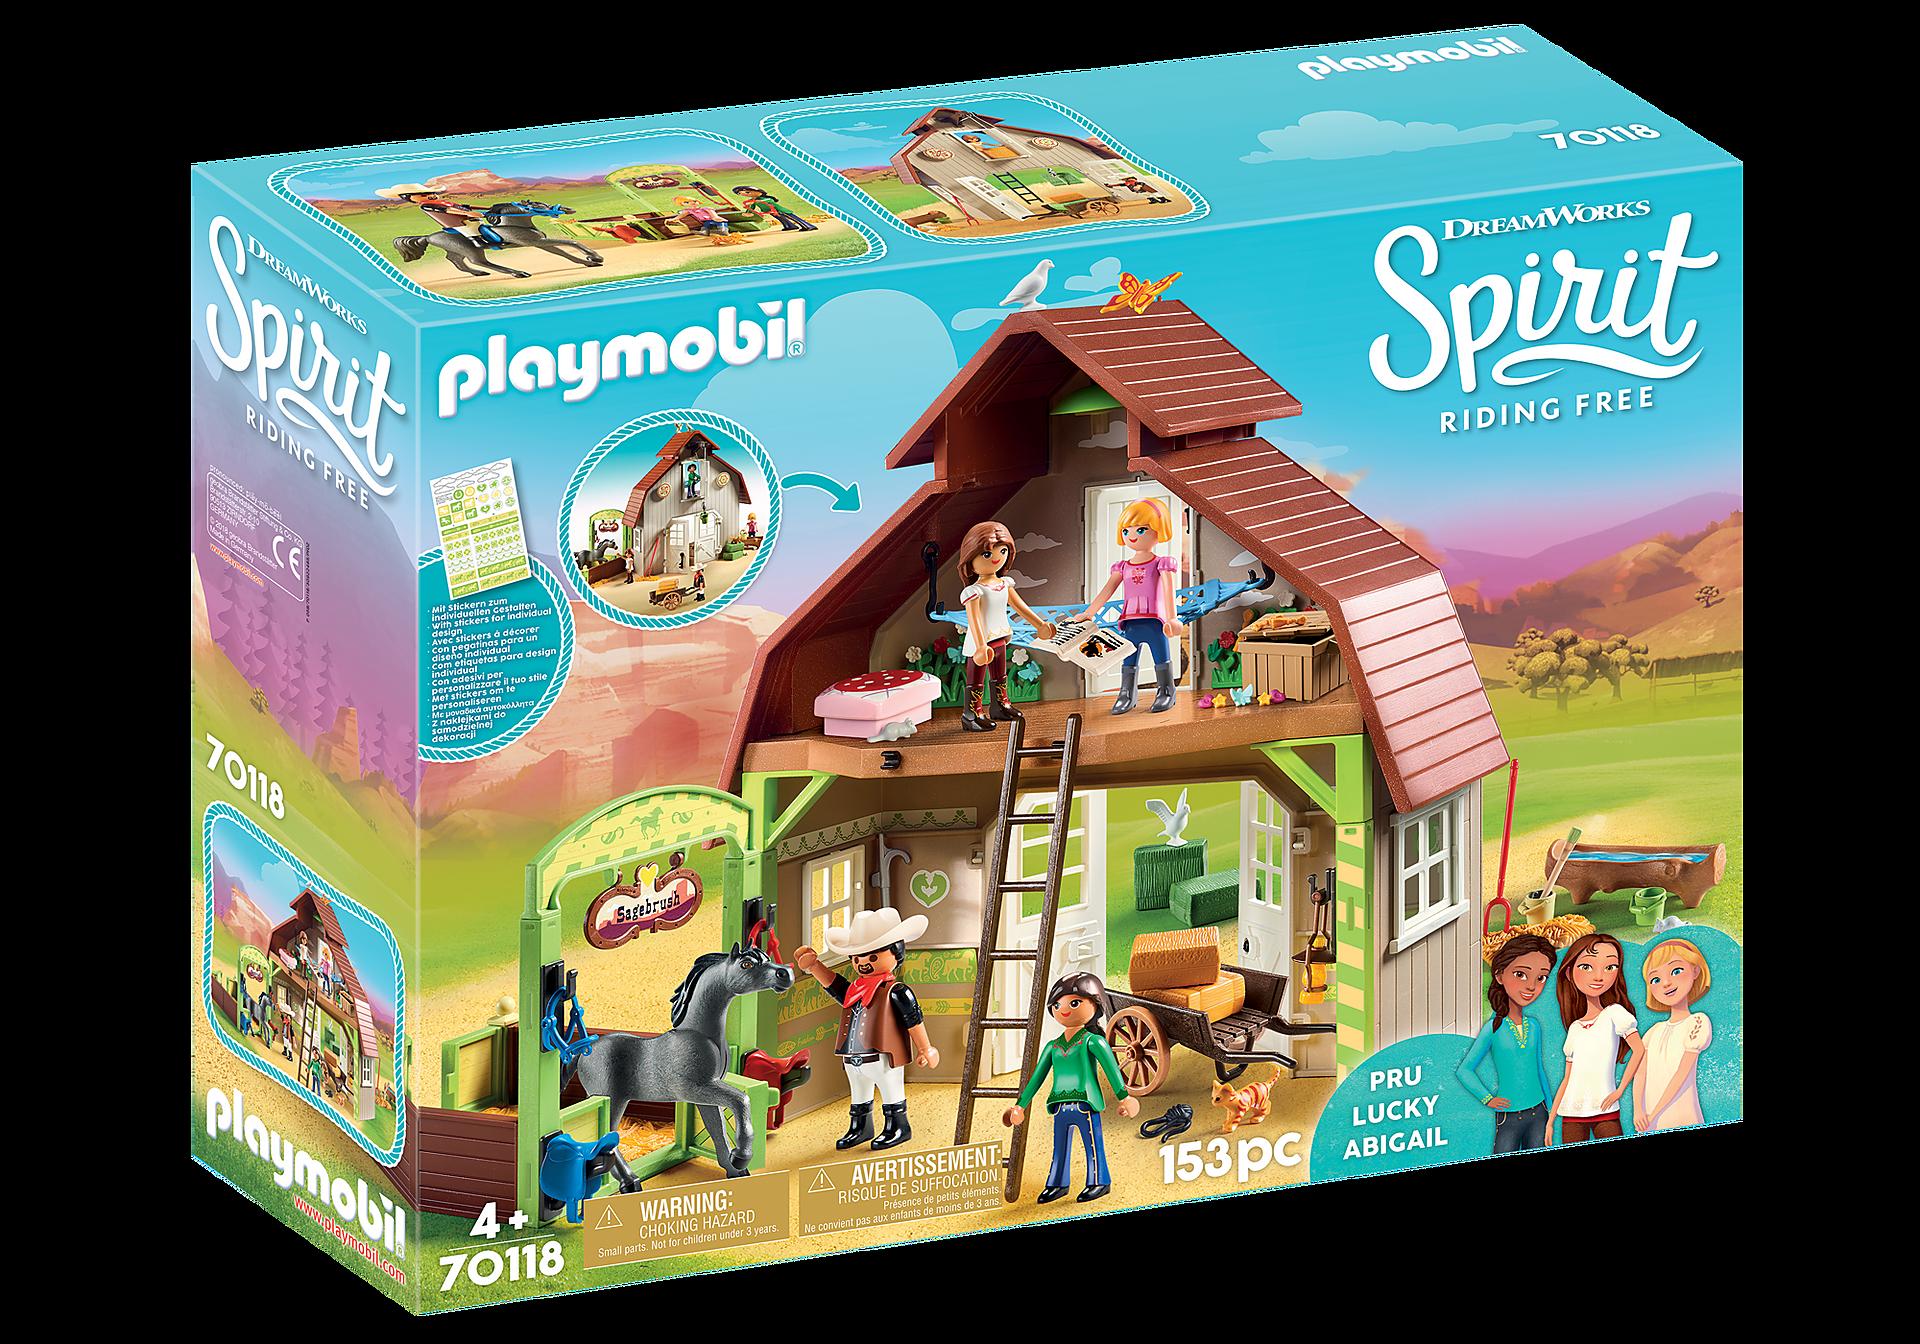 http://media.playmobil.com/i/playmobil/70118_product_box_front/Lade med Lucky, Pru og Abigail